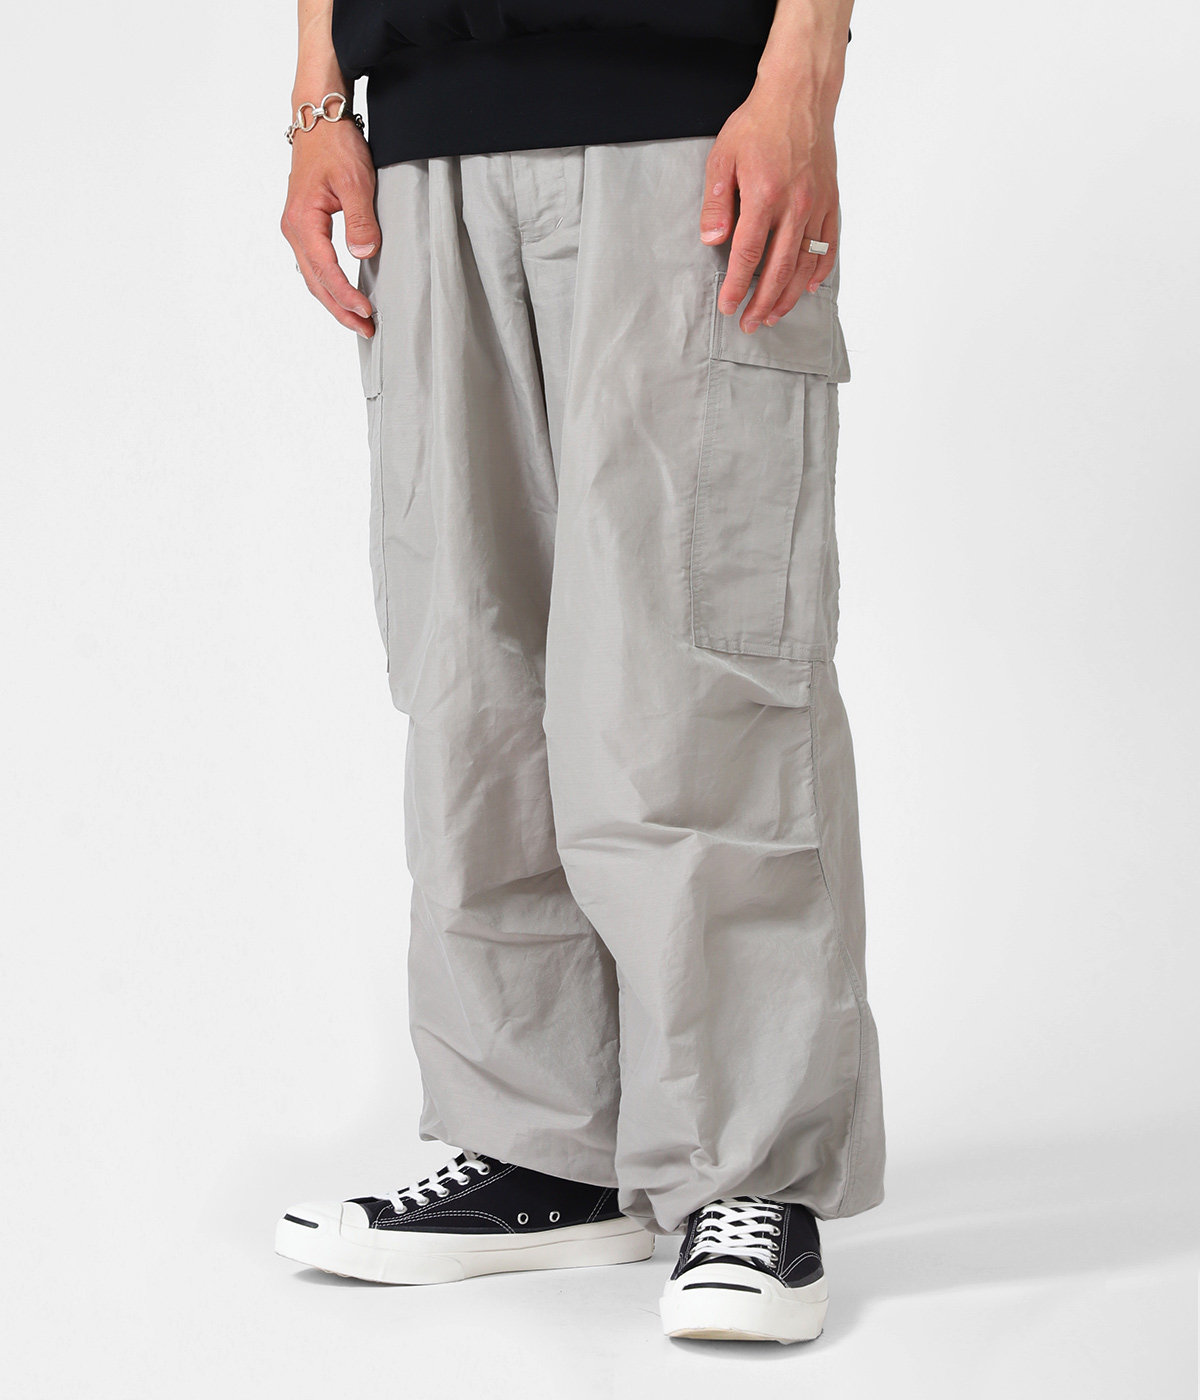 OVER PANTS